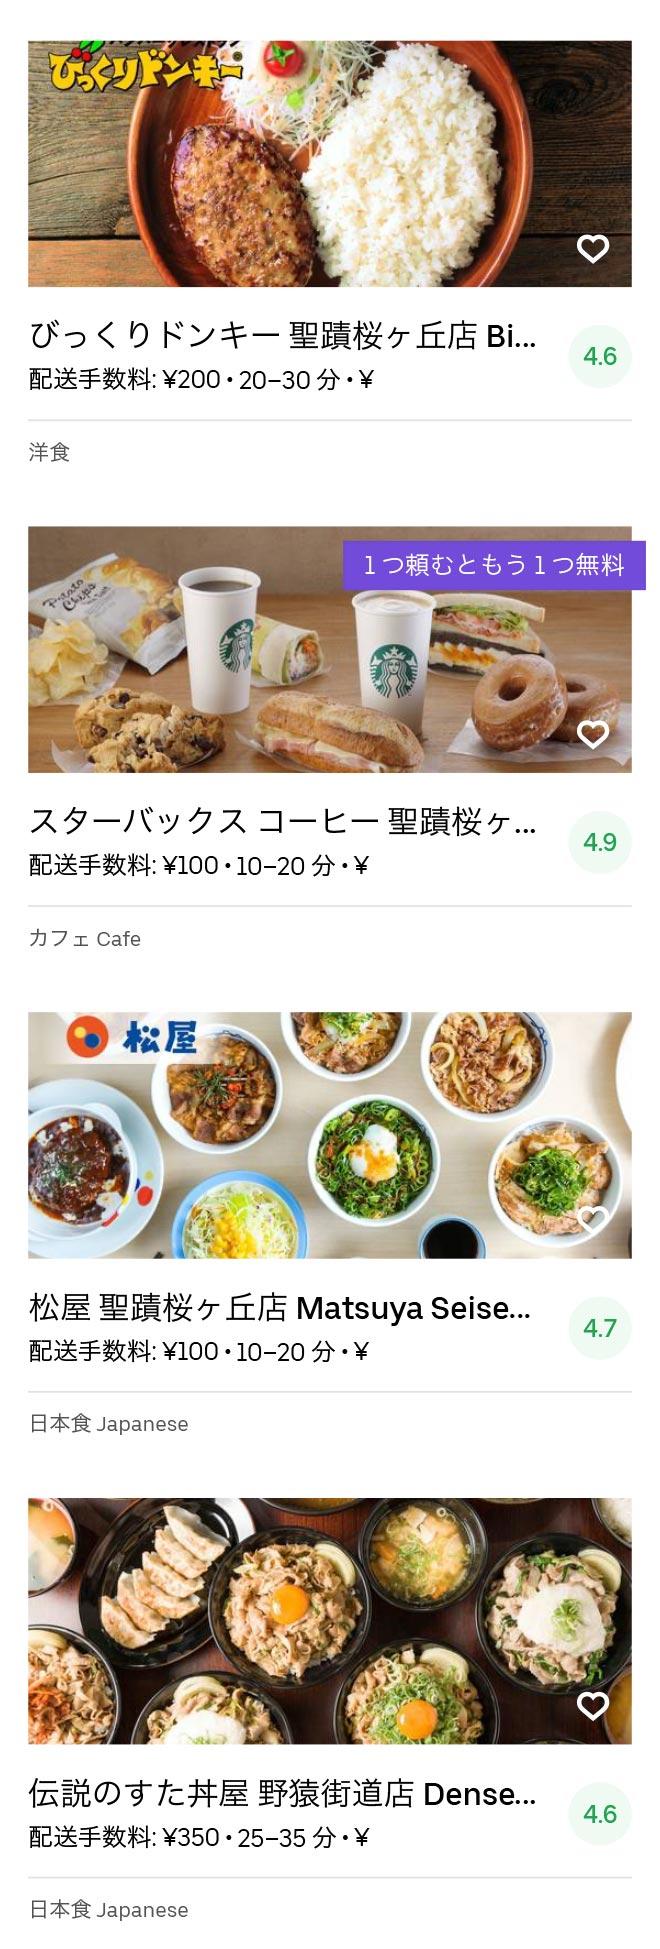 Seiseki menu 2007 11